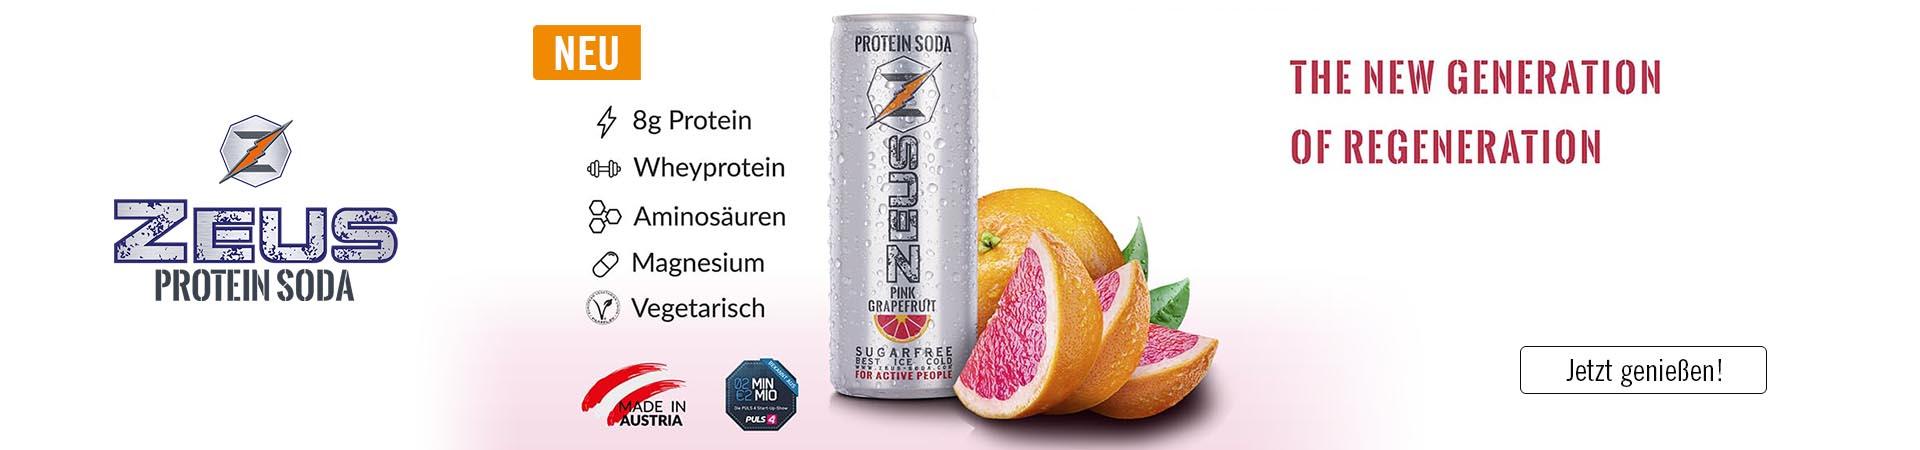 Zeus Protein Soda